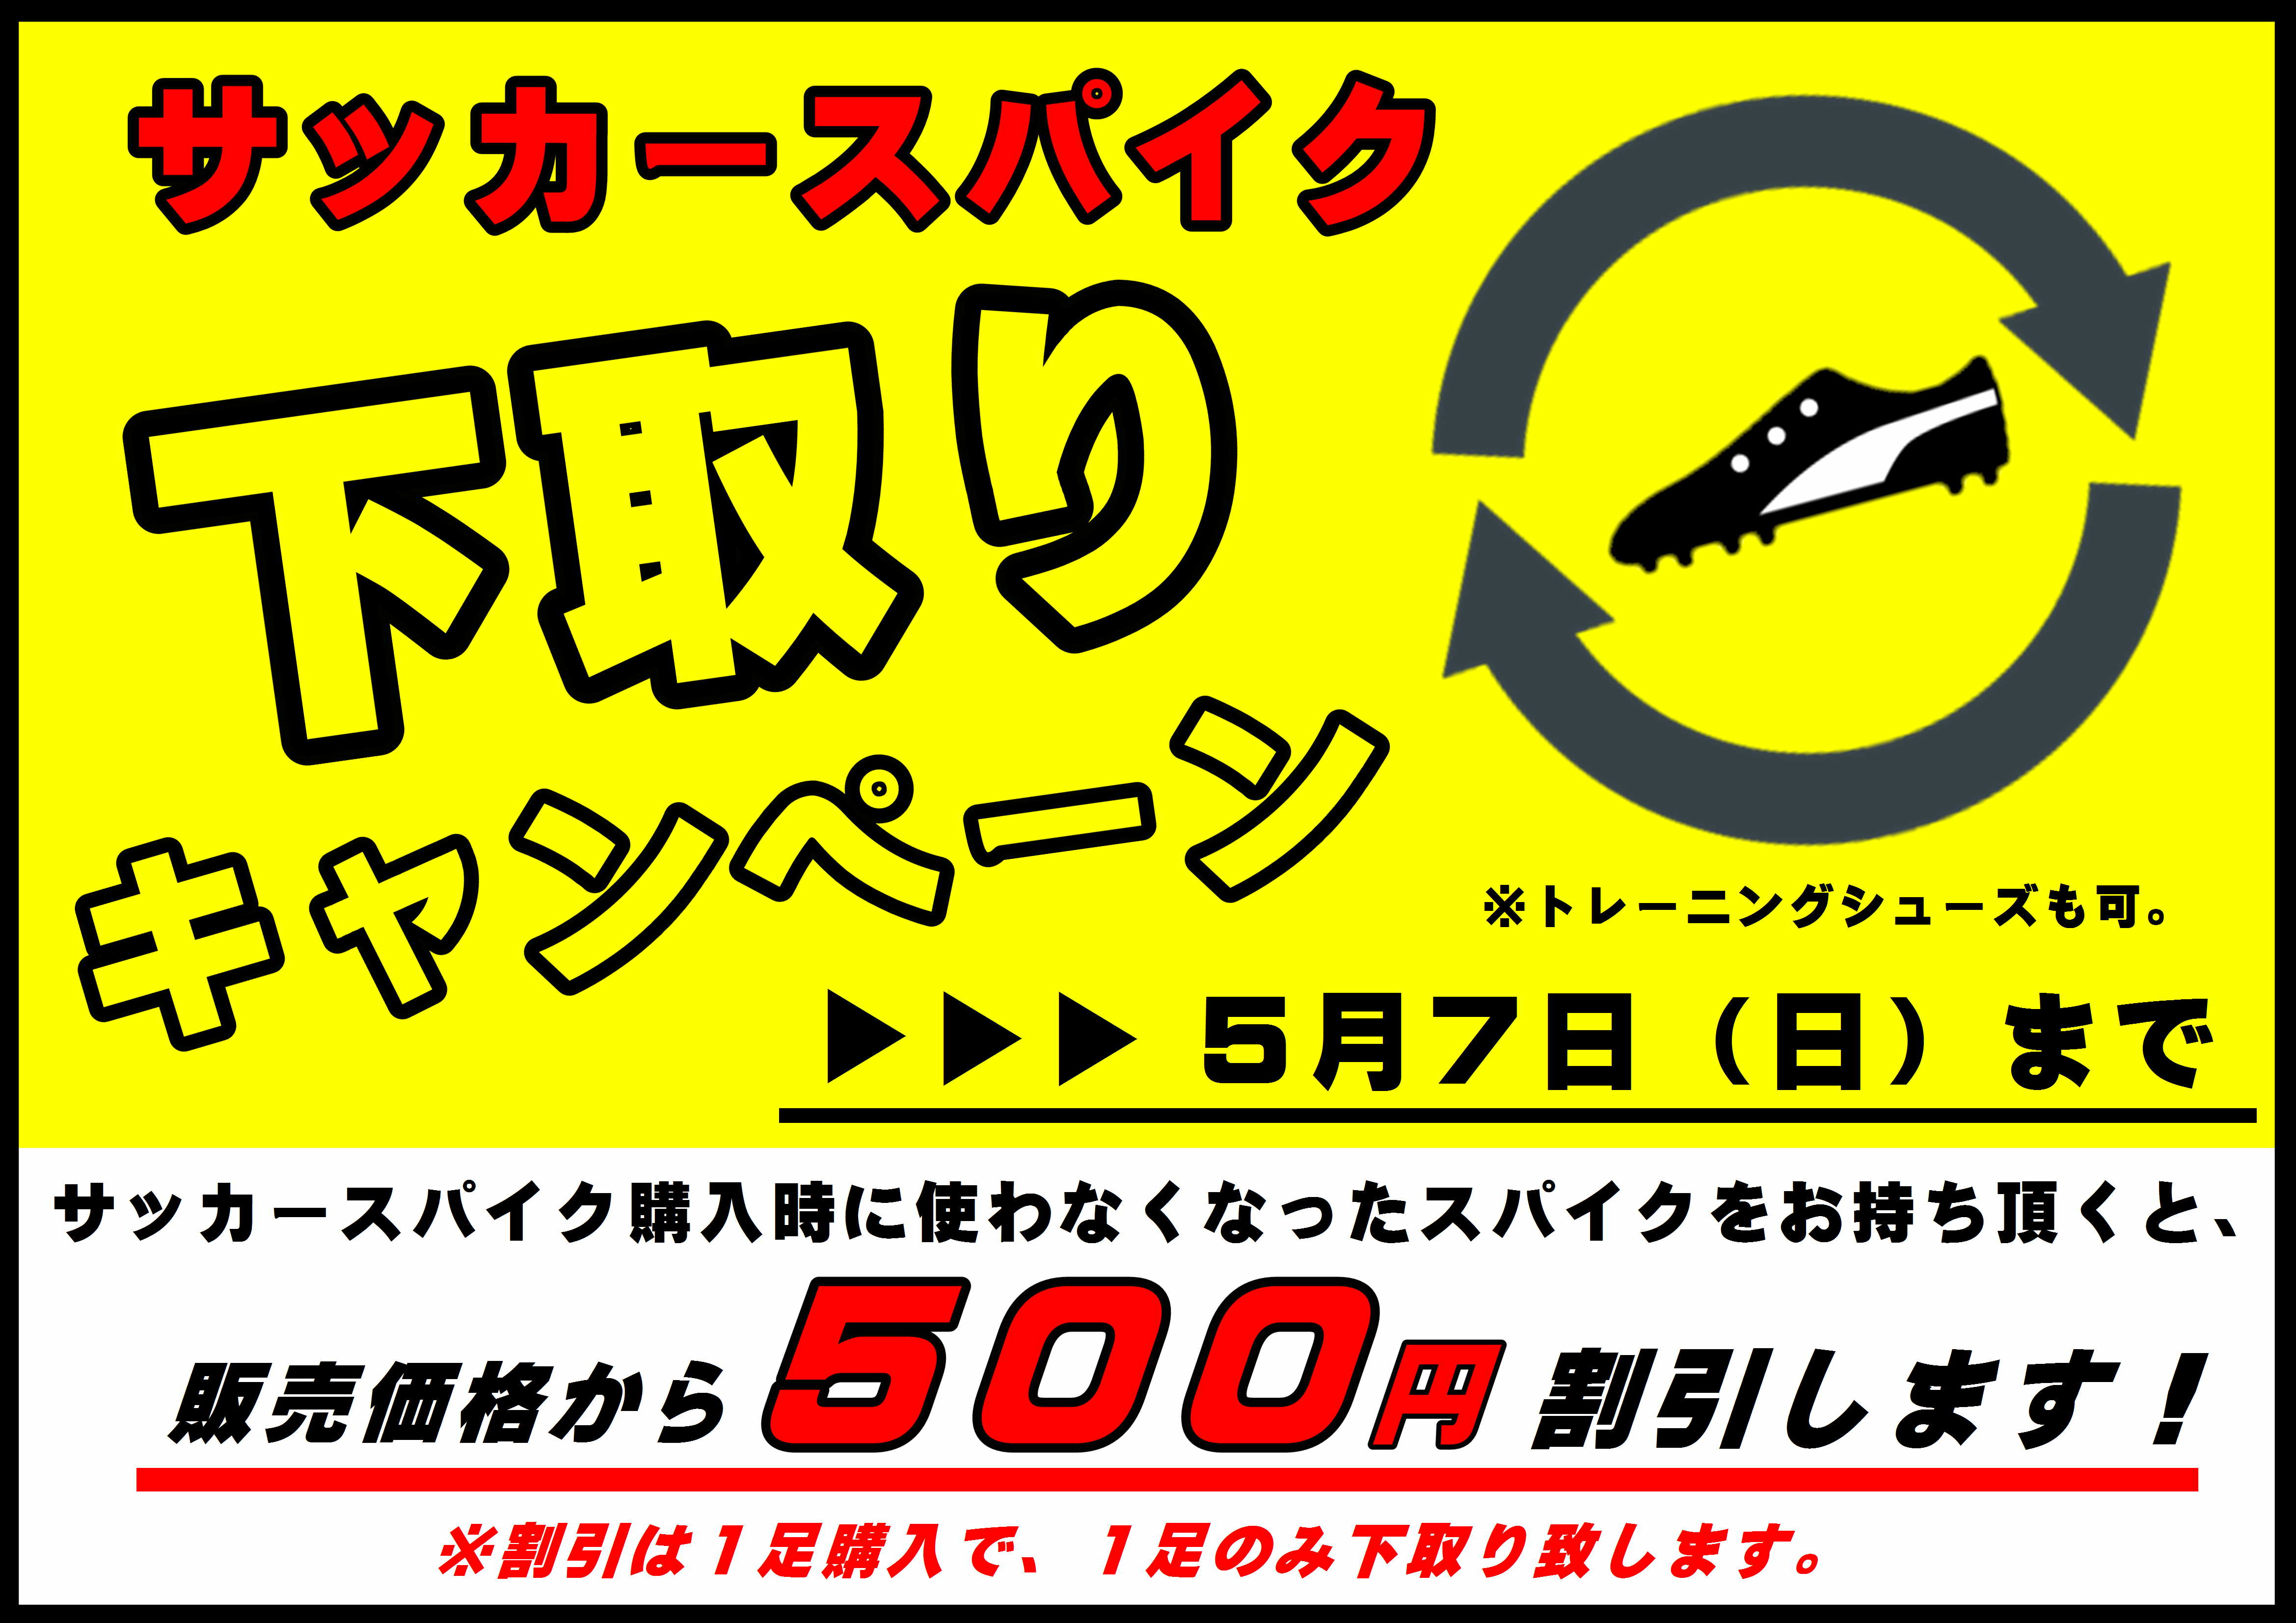 http://www.playsports.jp/news/images/%E4%B8%8B%E5%8F%96%E3%82%8A.JPEG